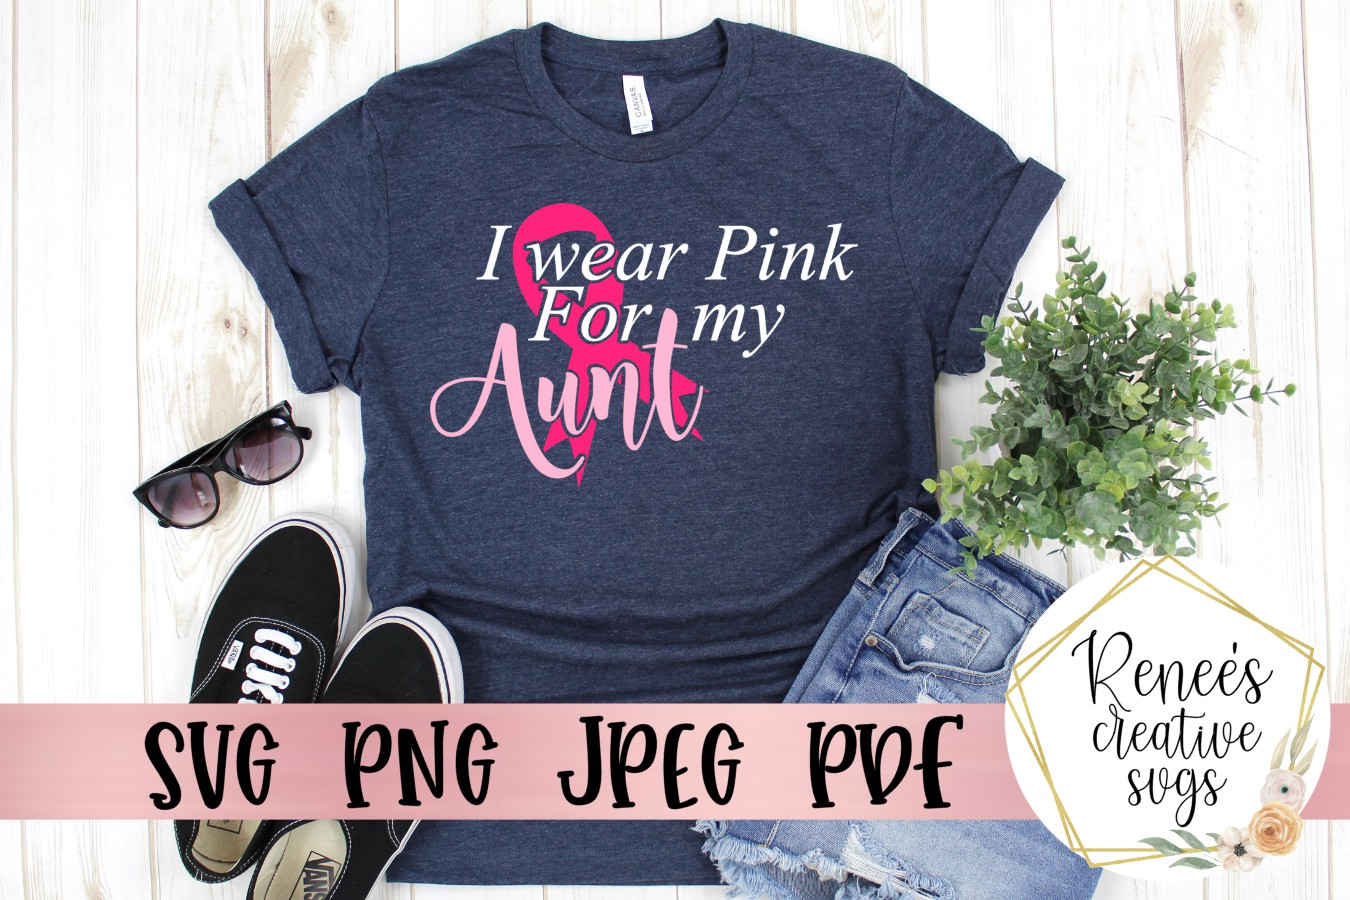 We Wear Pink Bundle|Breast cancer awareness | SVG Cut File example image 4